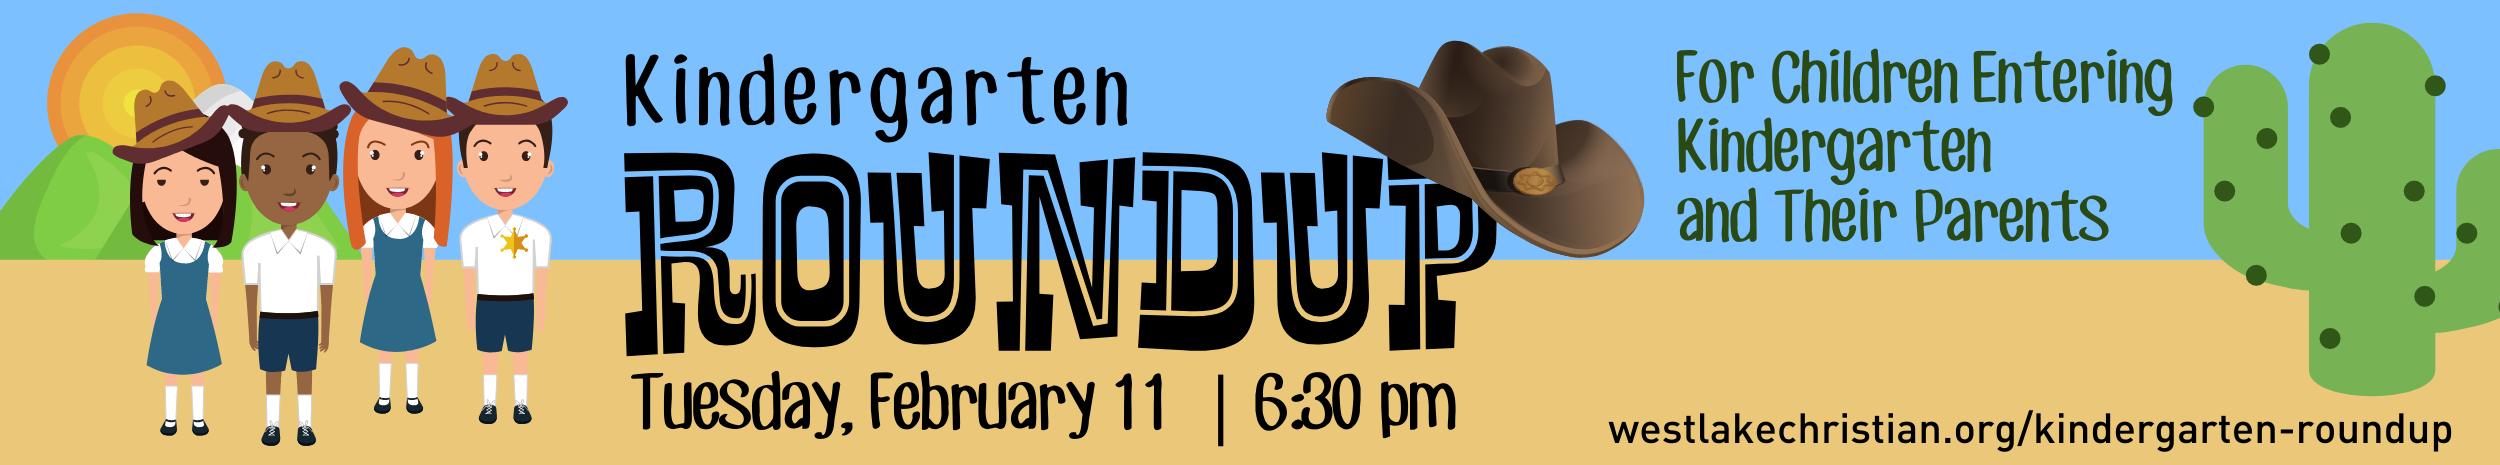 Kindergarten Roundup 2020 - Tuesday, February 11, 6:30 PM